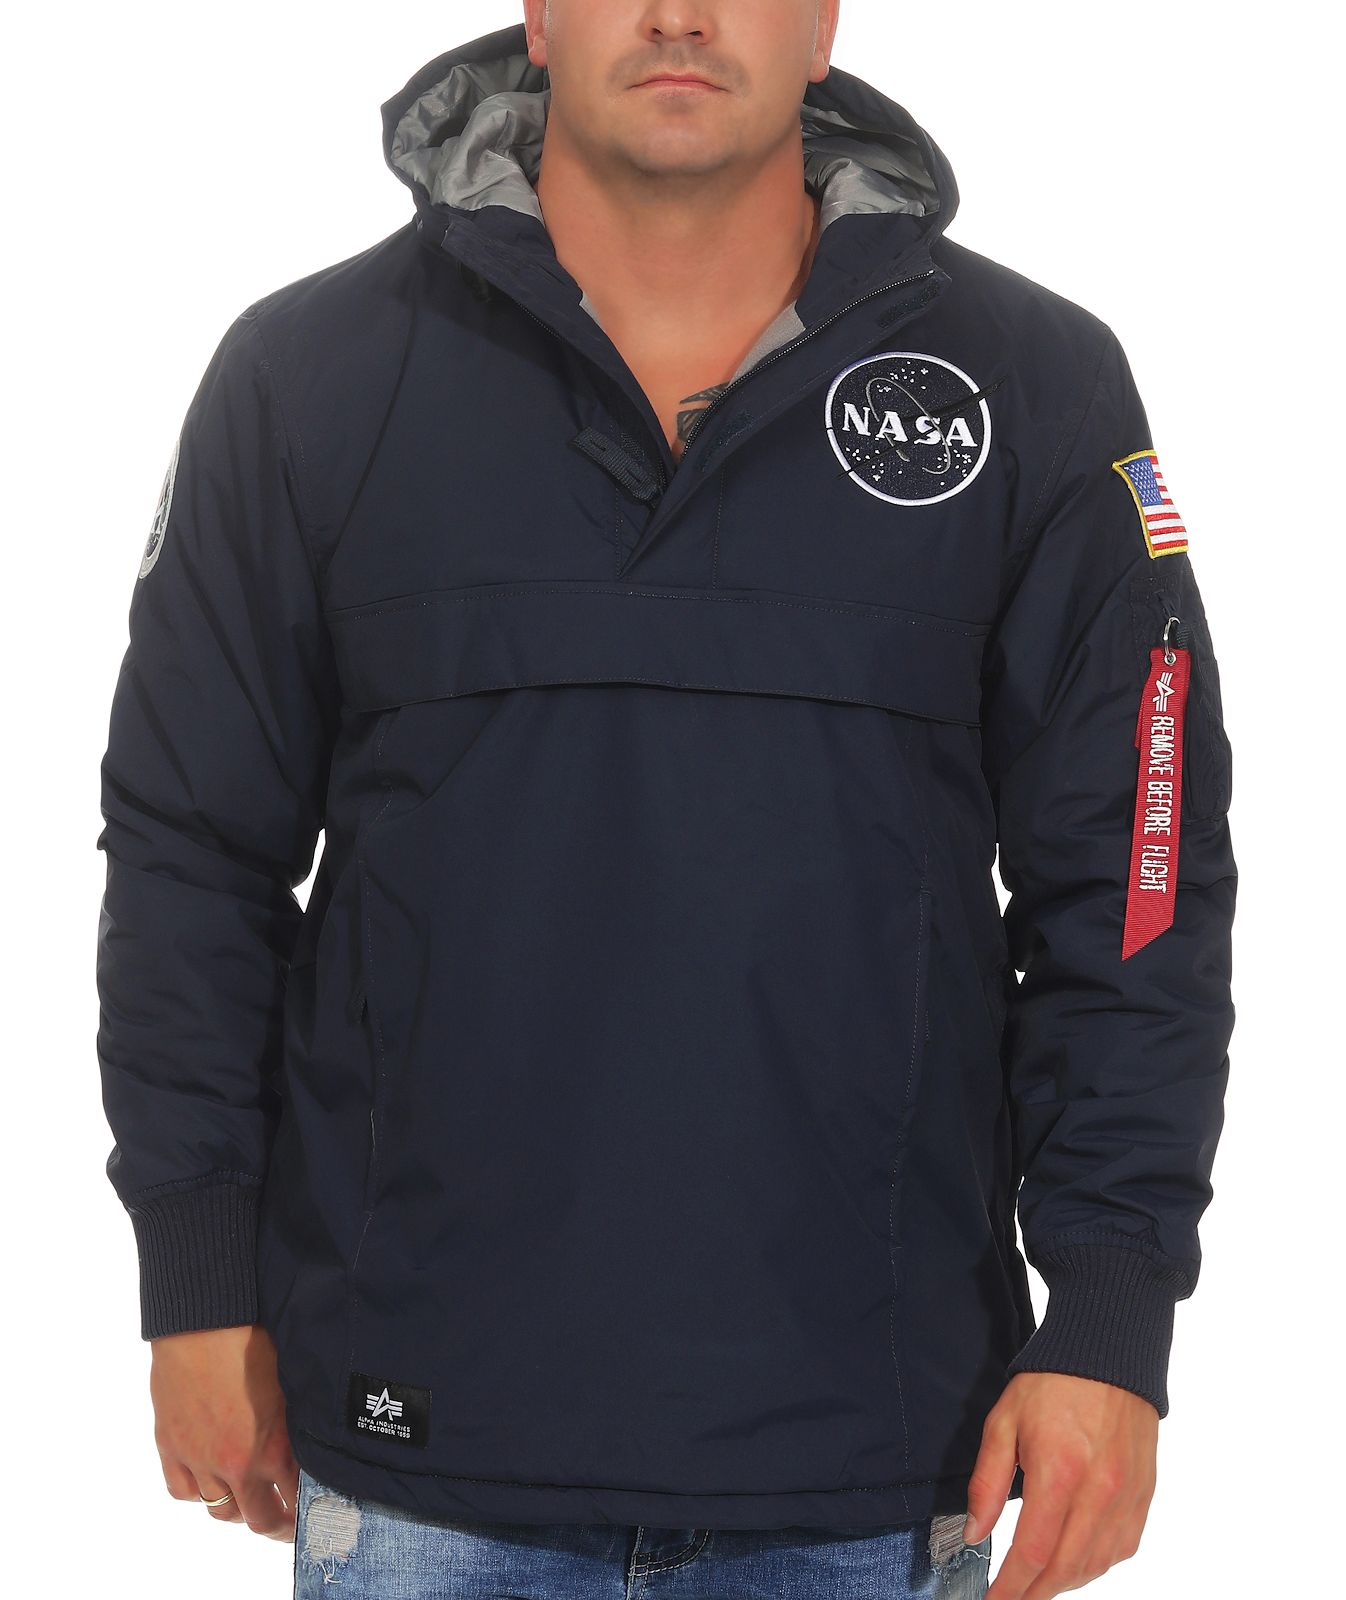 Details zu Alpha Industries Herren Jacke Windbreaker Übergangsjacke Windjacke NASA 188133